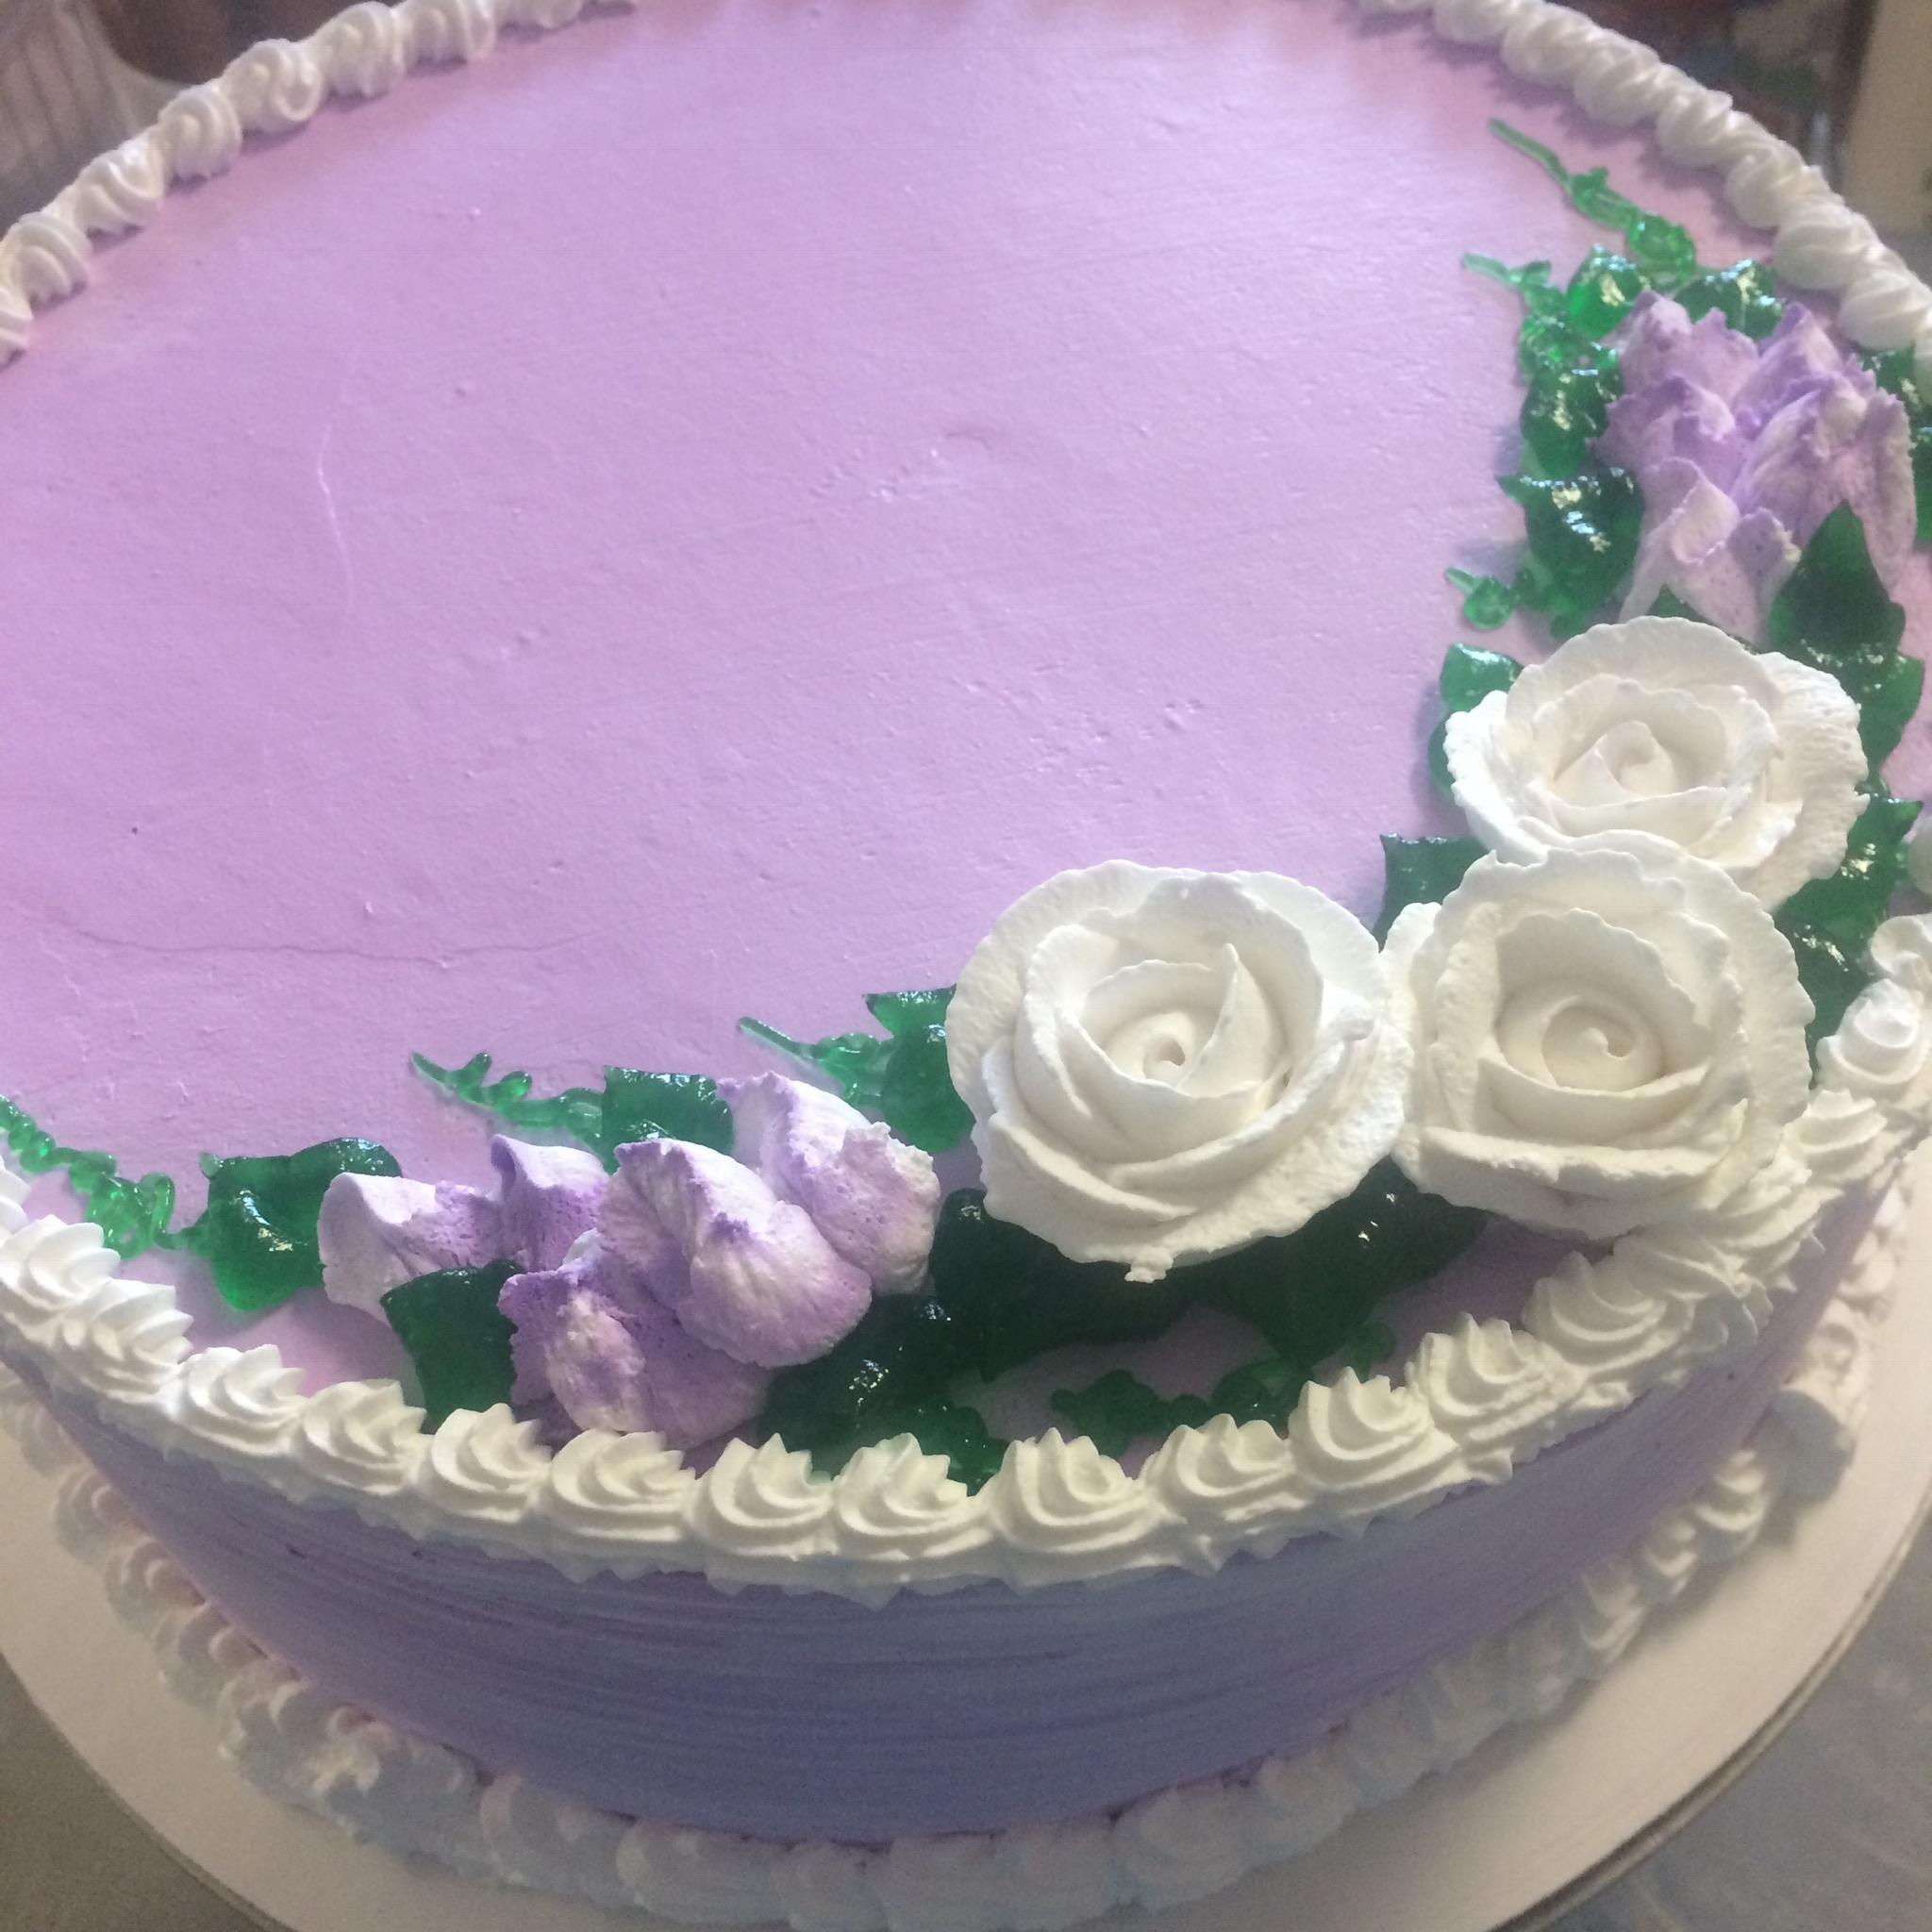 Cake Design #30